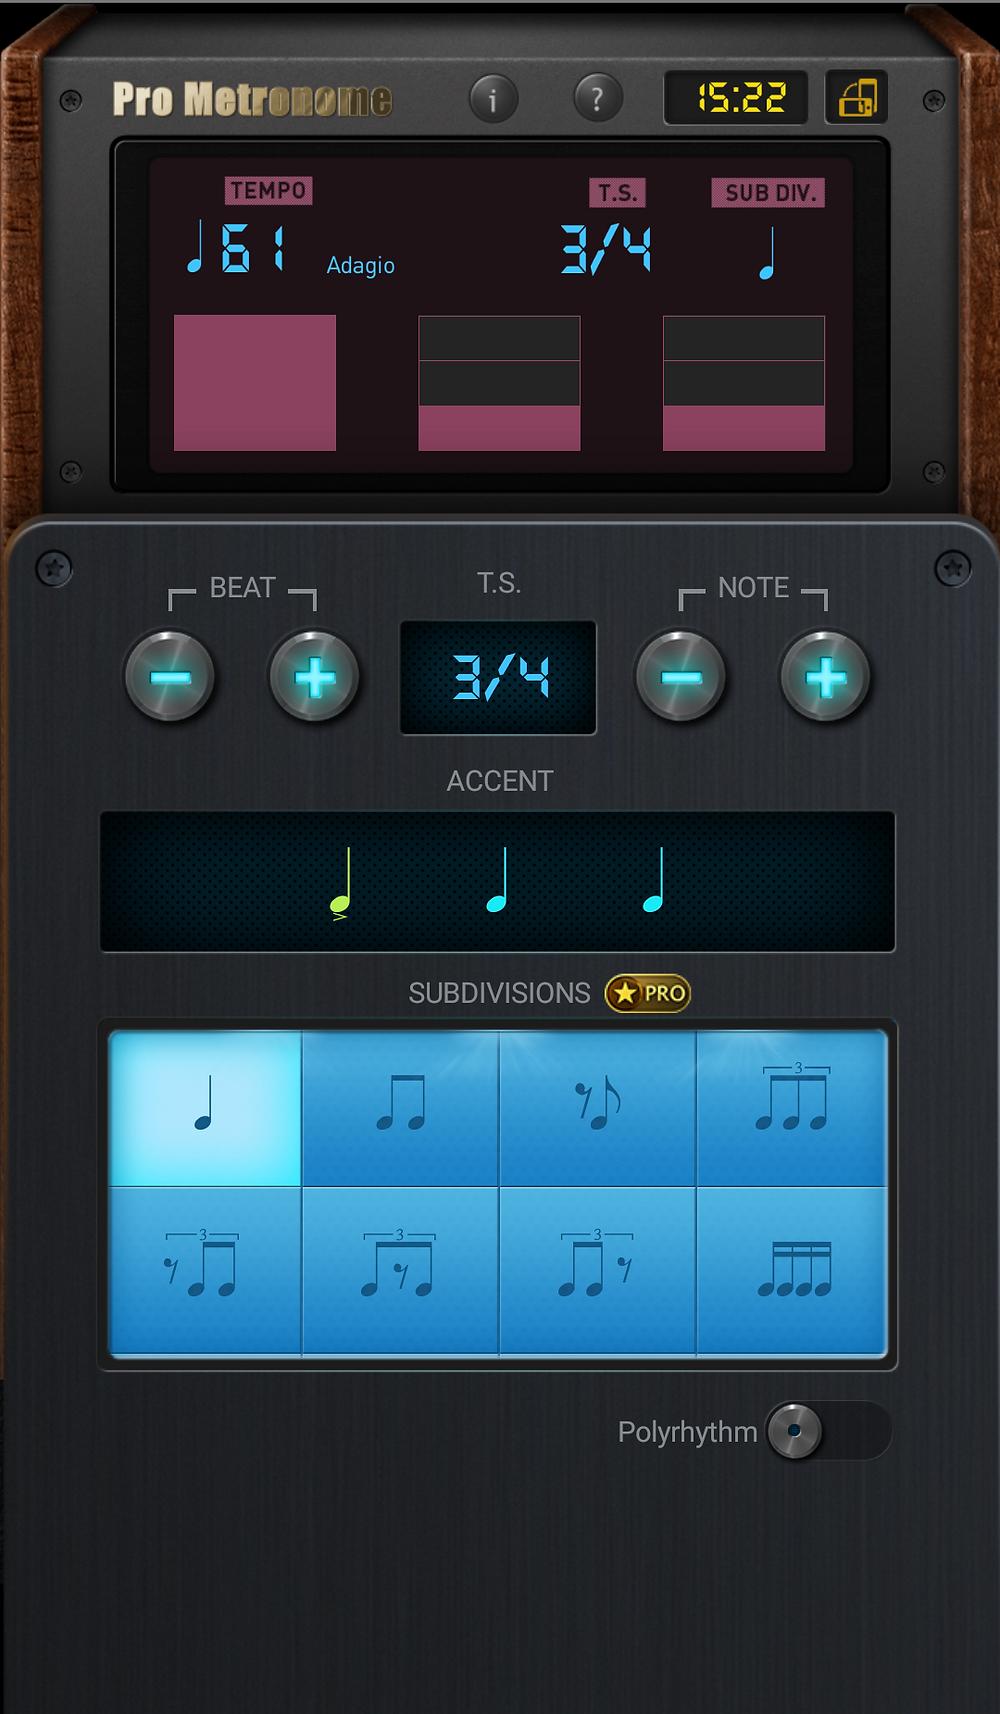 Pro Metronome App: Time Signature Options